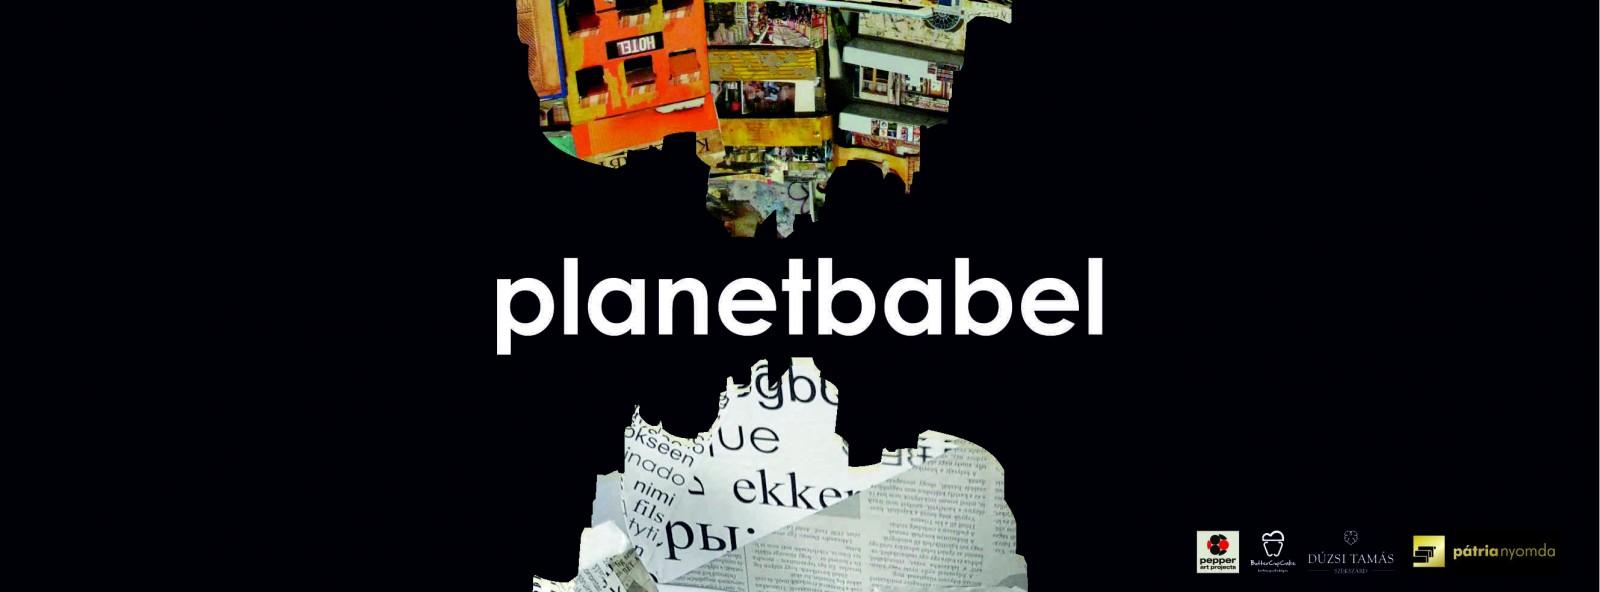 header_boros_kerekes_planetbabel(2)